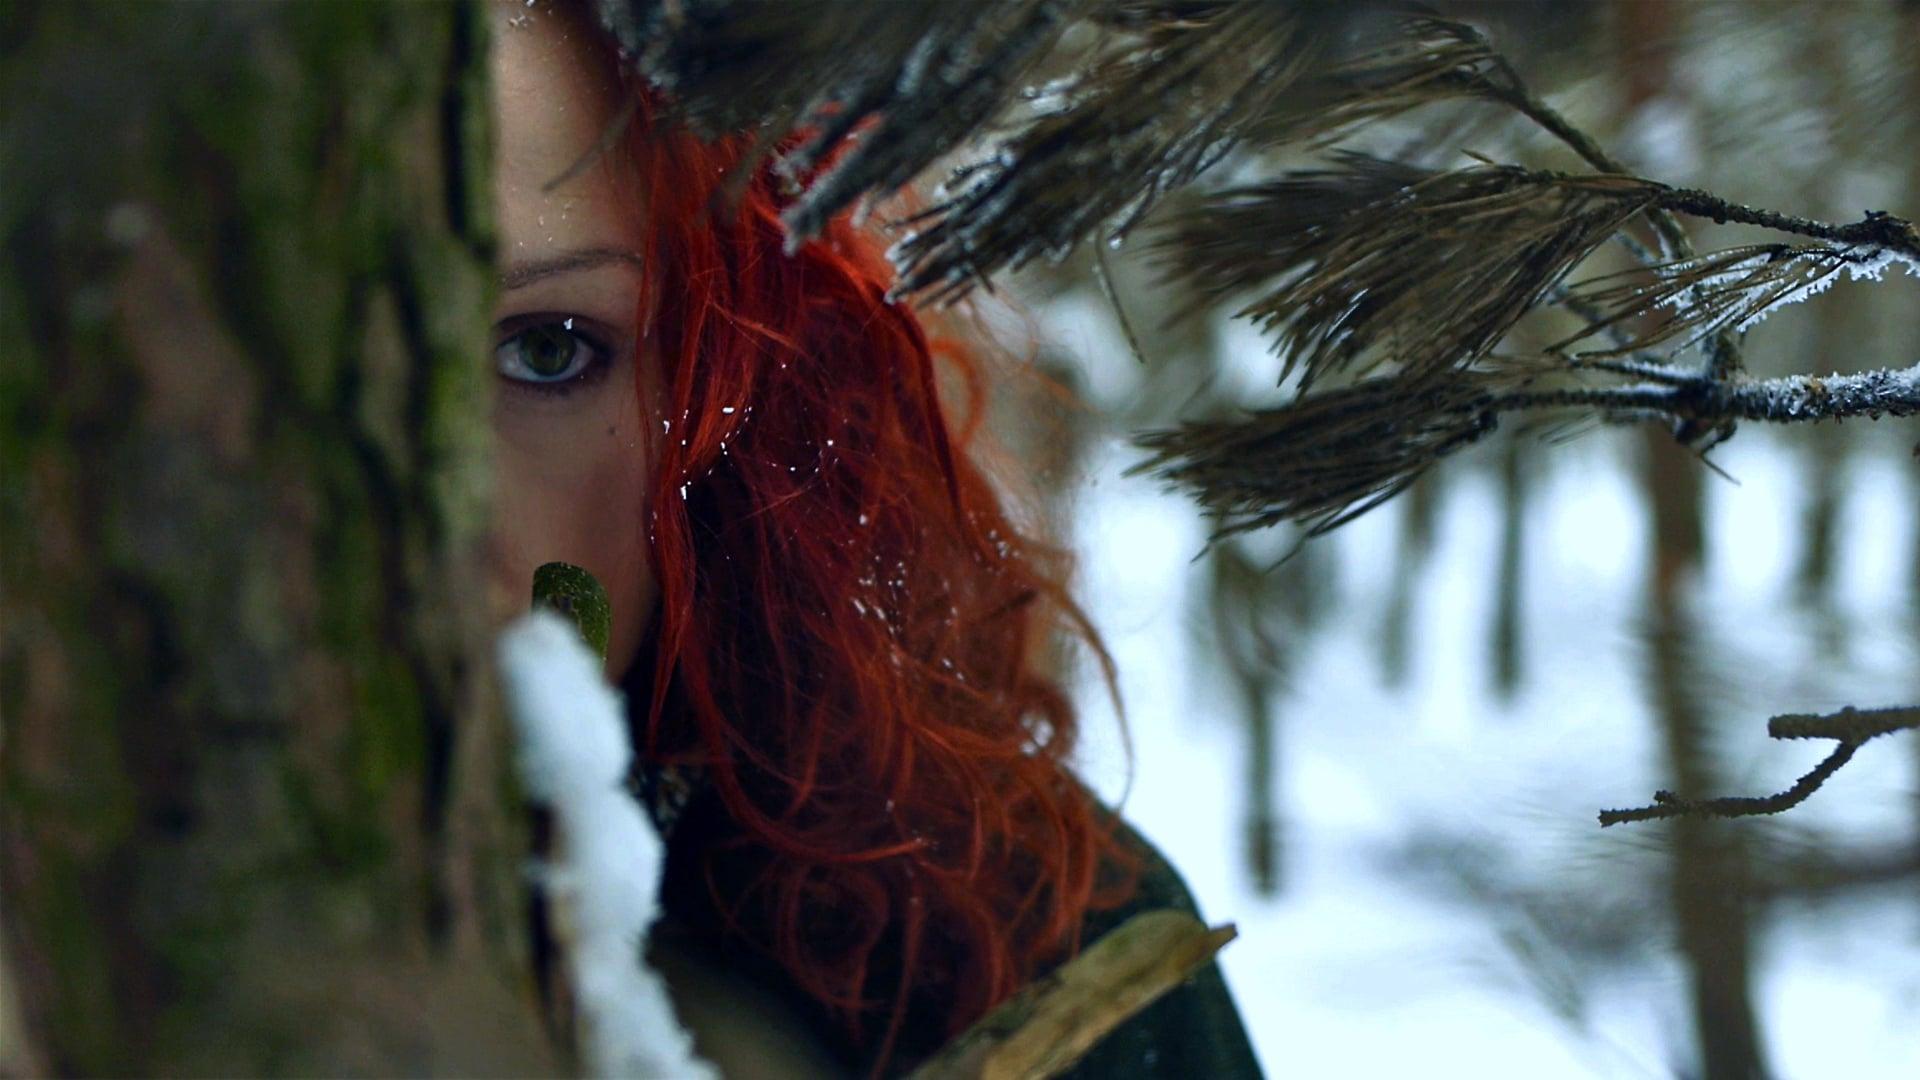 'The Hunt' - film excerpt 'Milkmaid'